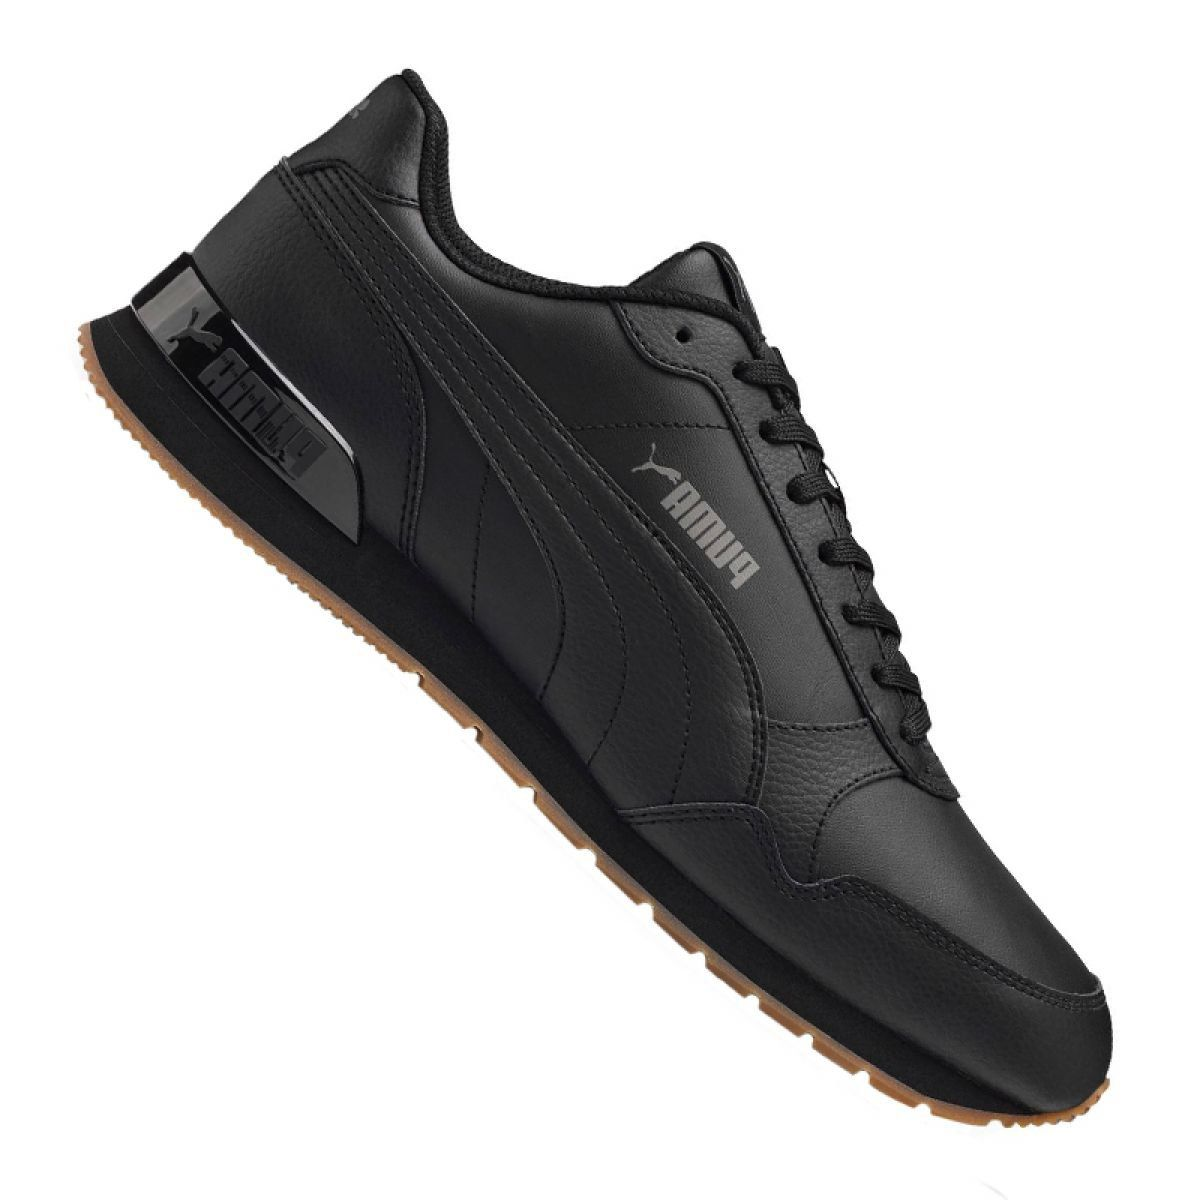 Buty Puma St Runner V2 Full L M 365277 08 Czarne Puma Puma Sneaker Shoes